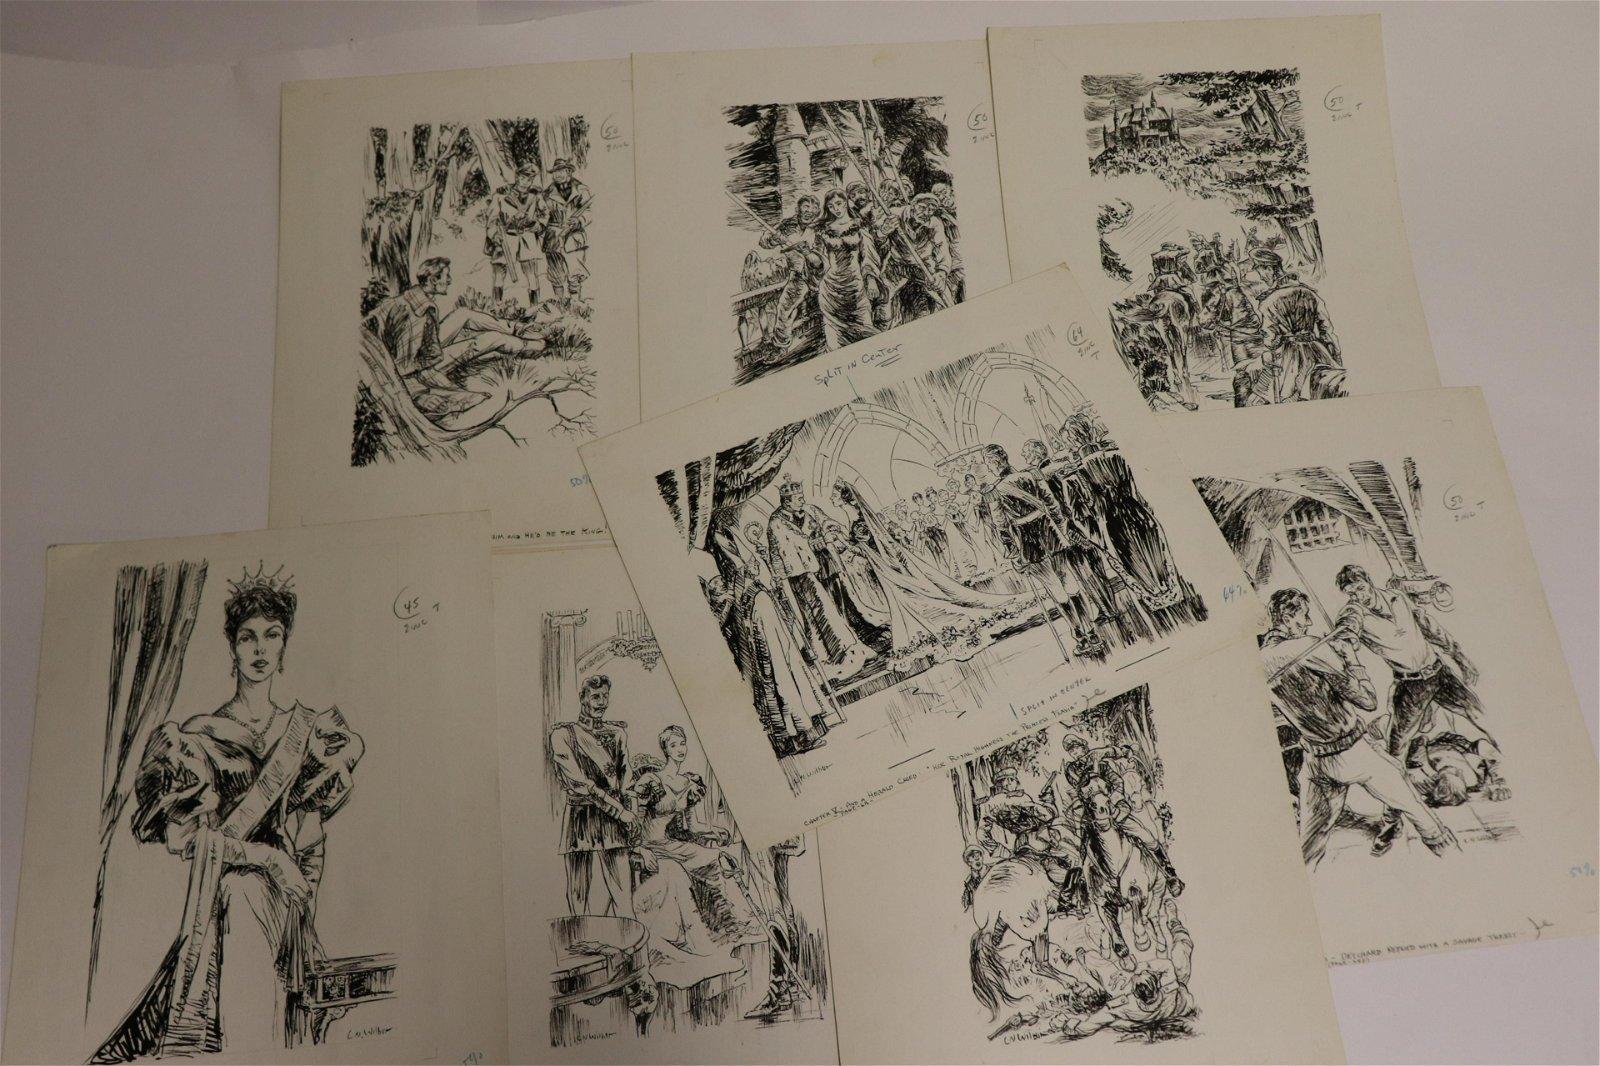 Lawrence Wilbur, 9 ink drawings, illustrations